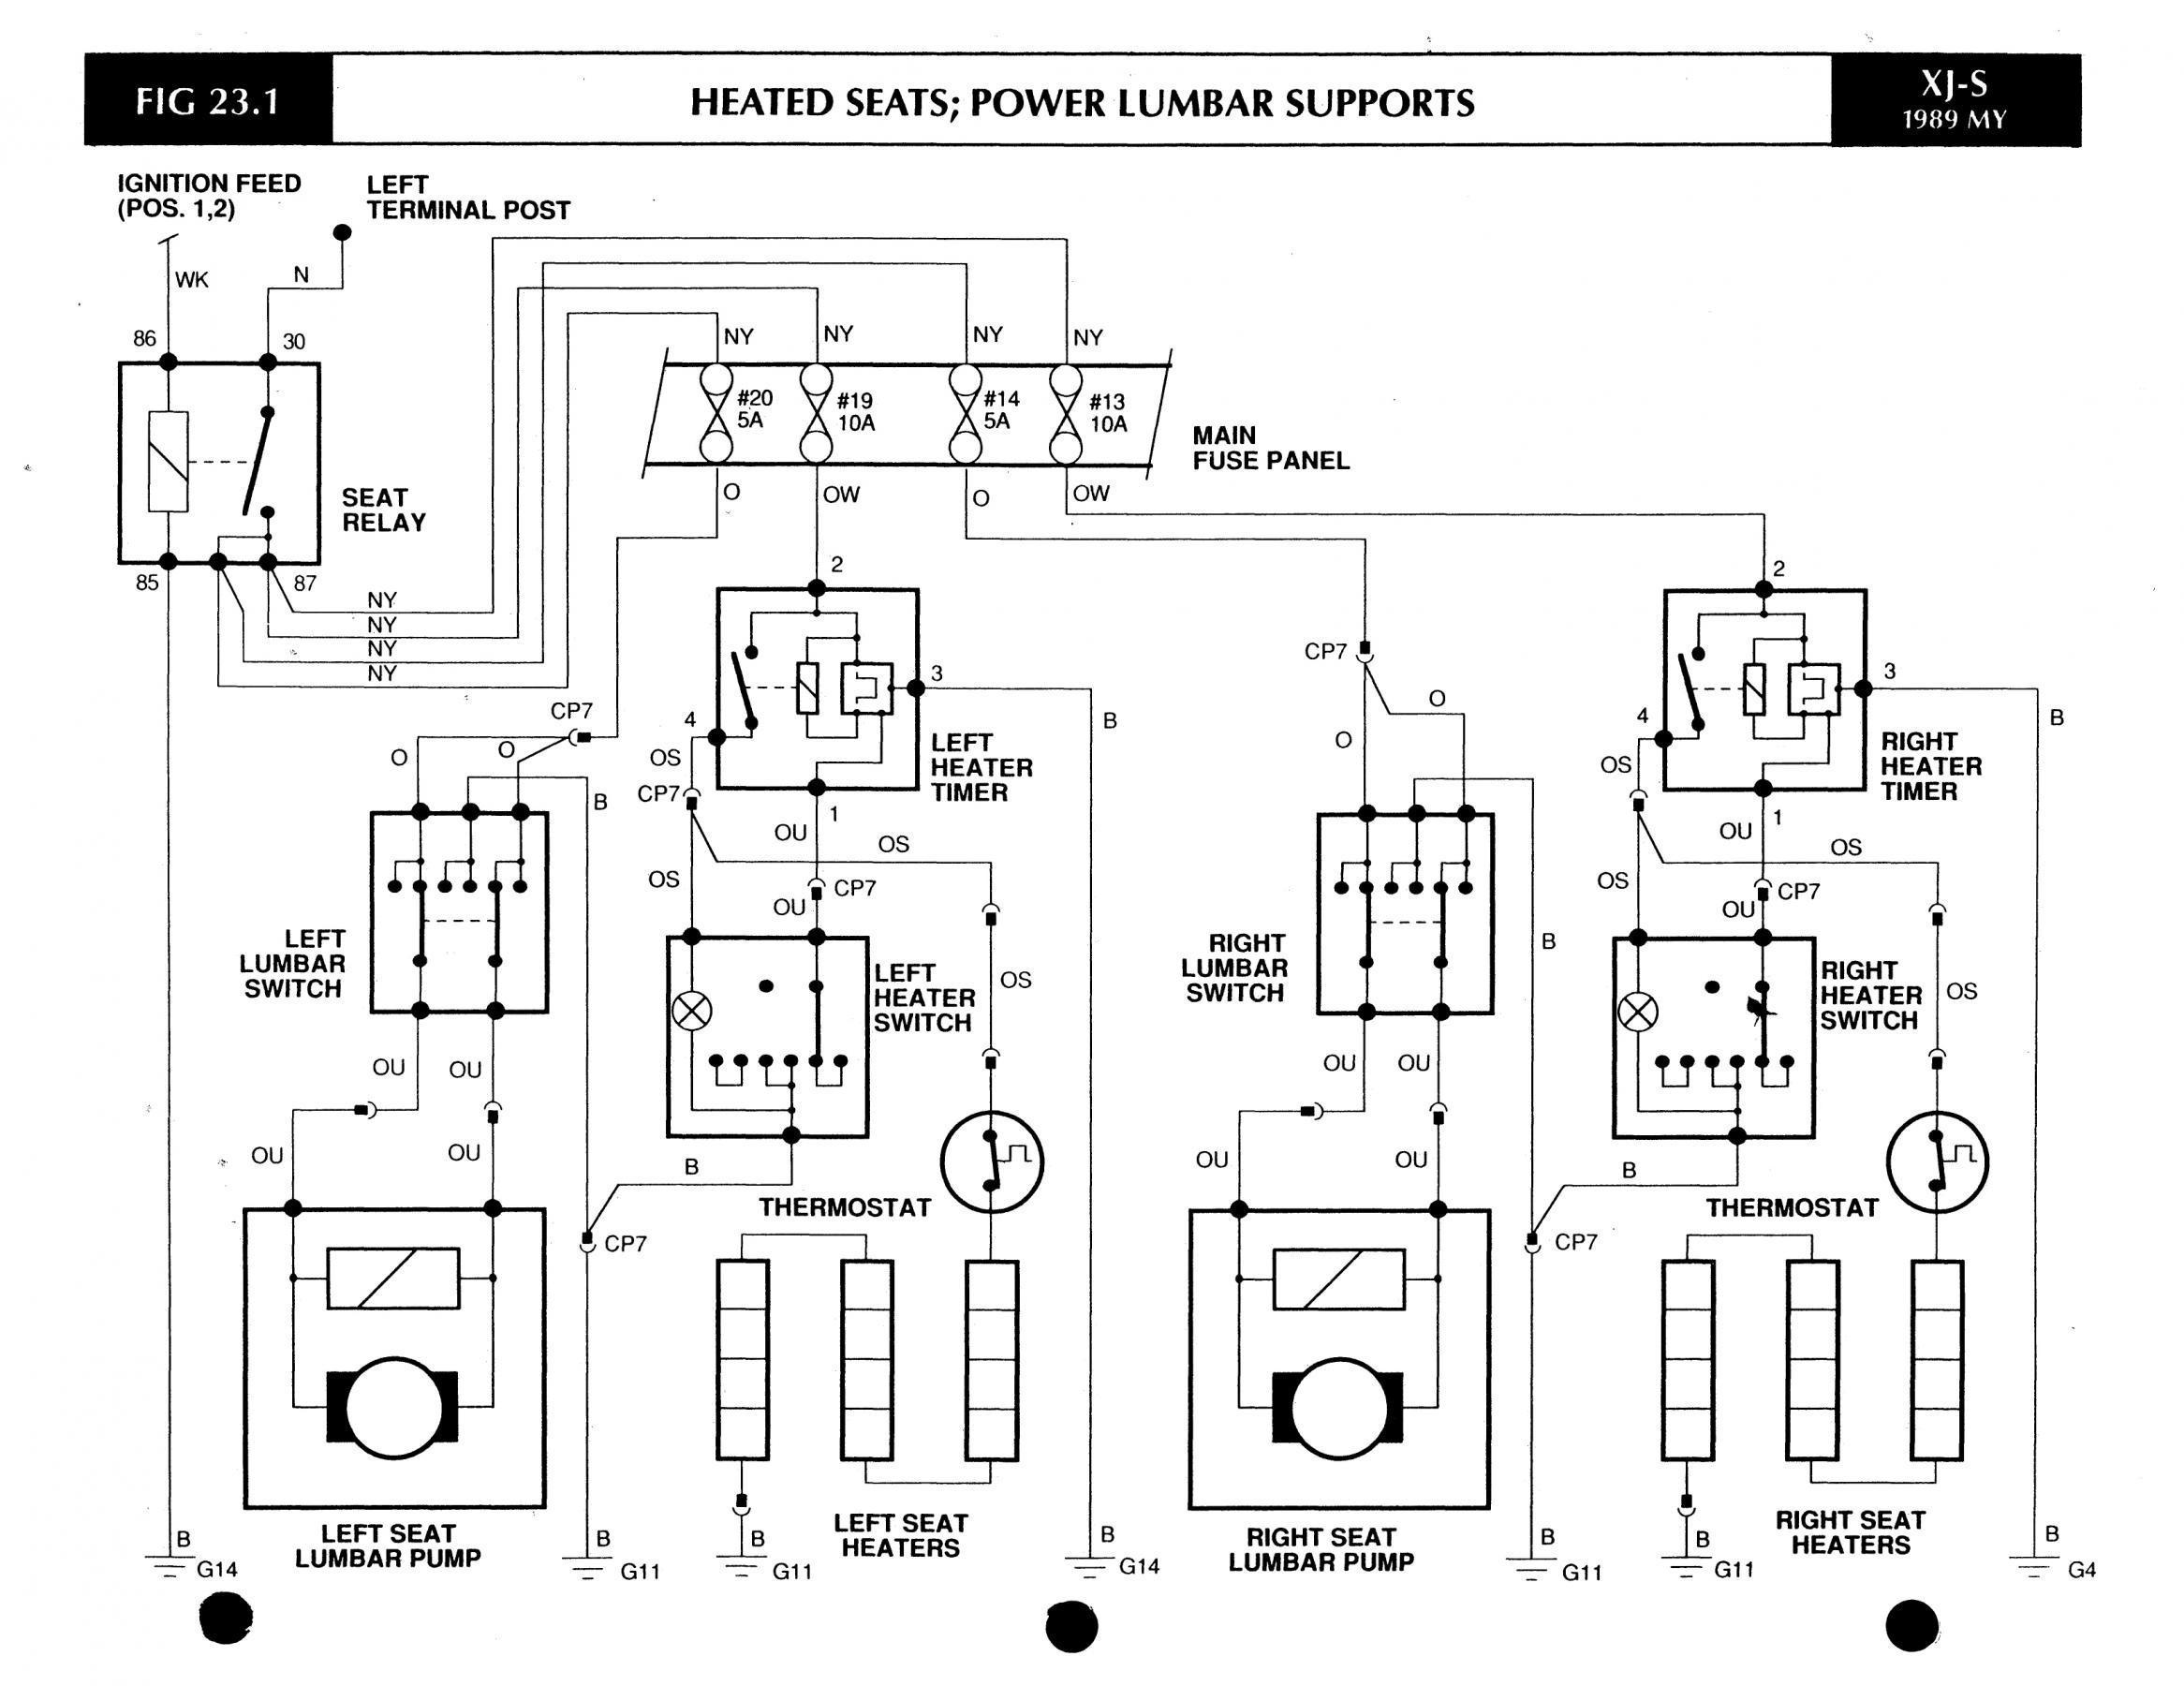 Jaguar S Type Engine Diagram Wiring Diagram Jaguar S Type Inspirationa Wiring Diagram Jaguar X Of Jaguar S Type Engine Diagram